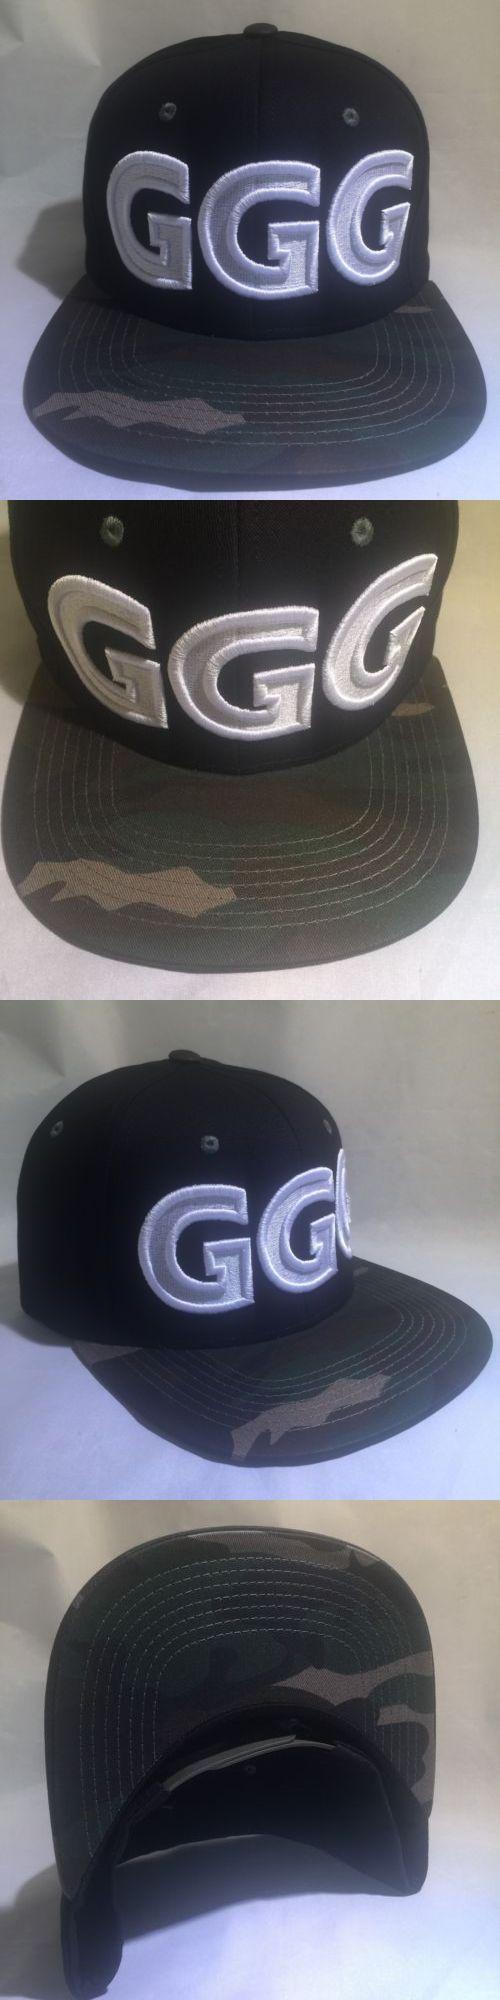 Headbands and Hats 179769: Ggg God Of War Canelo Alvarez Gennady Golovkin Boxing Hat Boxer Snapback Camo -> BUY IT NOW ONLY: $34.99 on eBay!